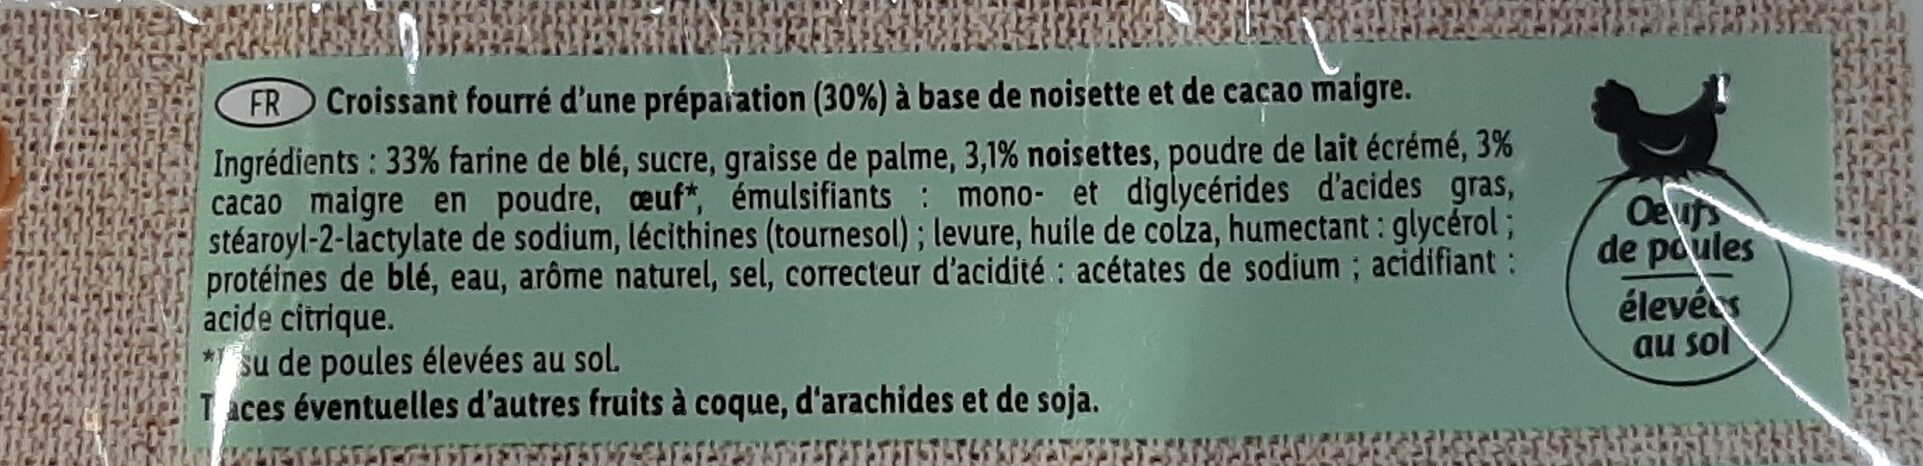 Croissants cacao Noisette - Ingredients - fr